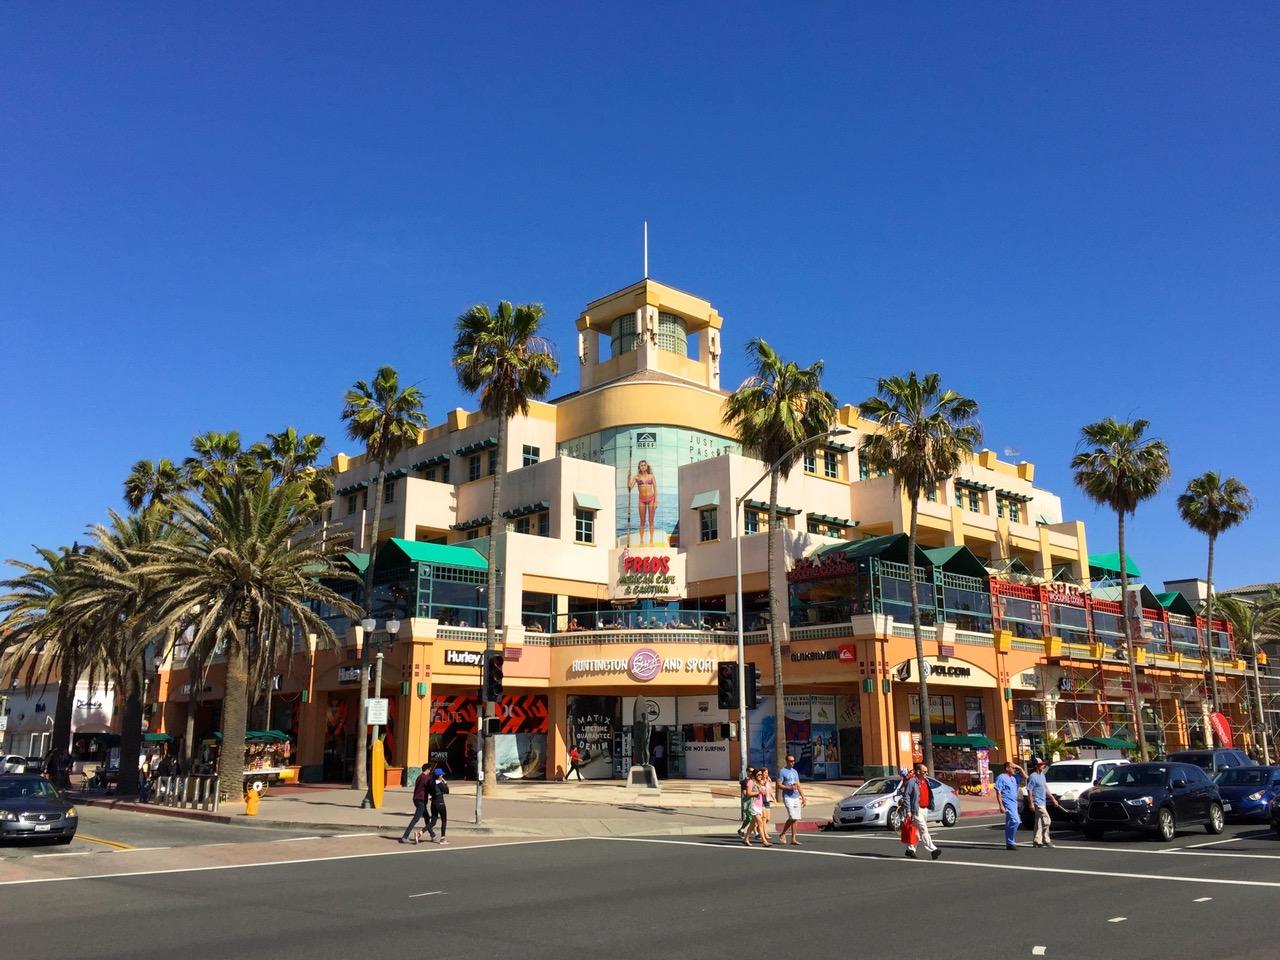 Famous Surf Store in Huntington Beach, California